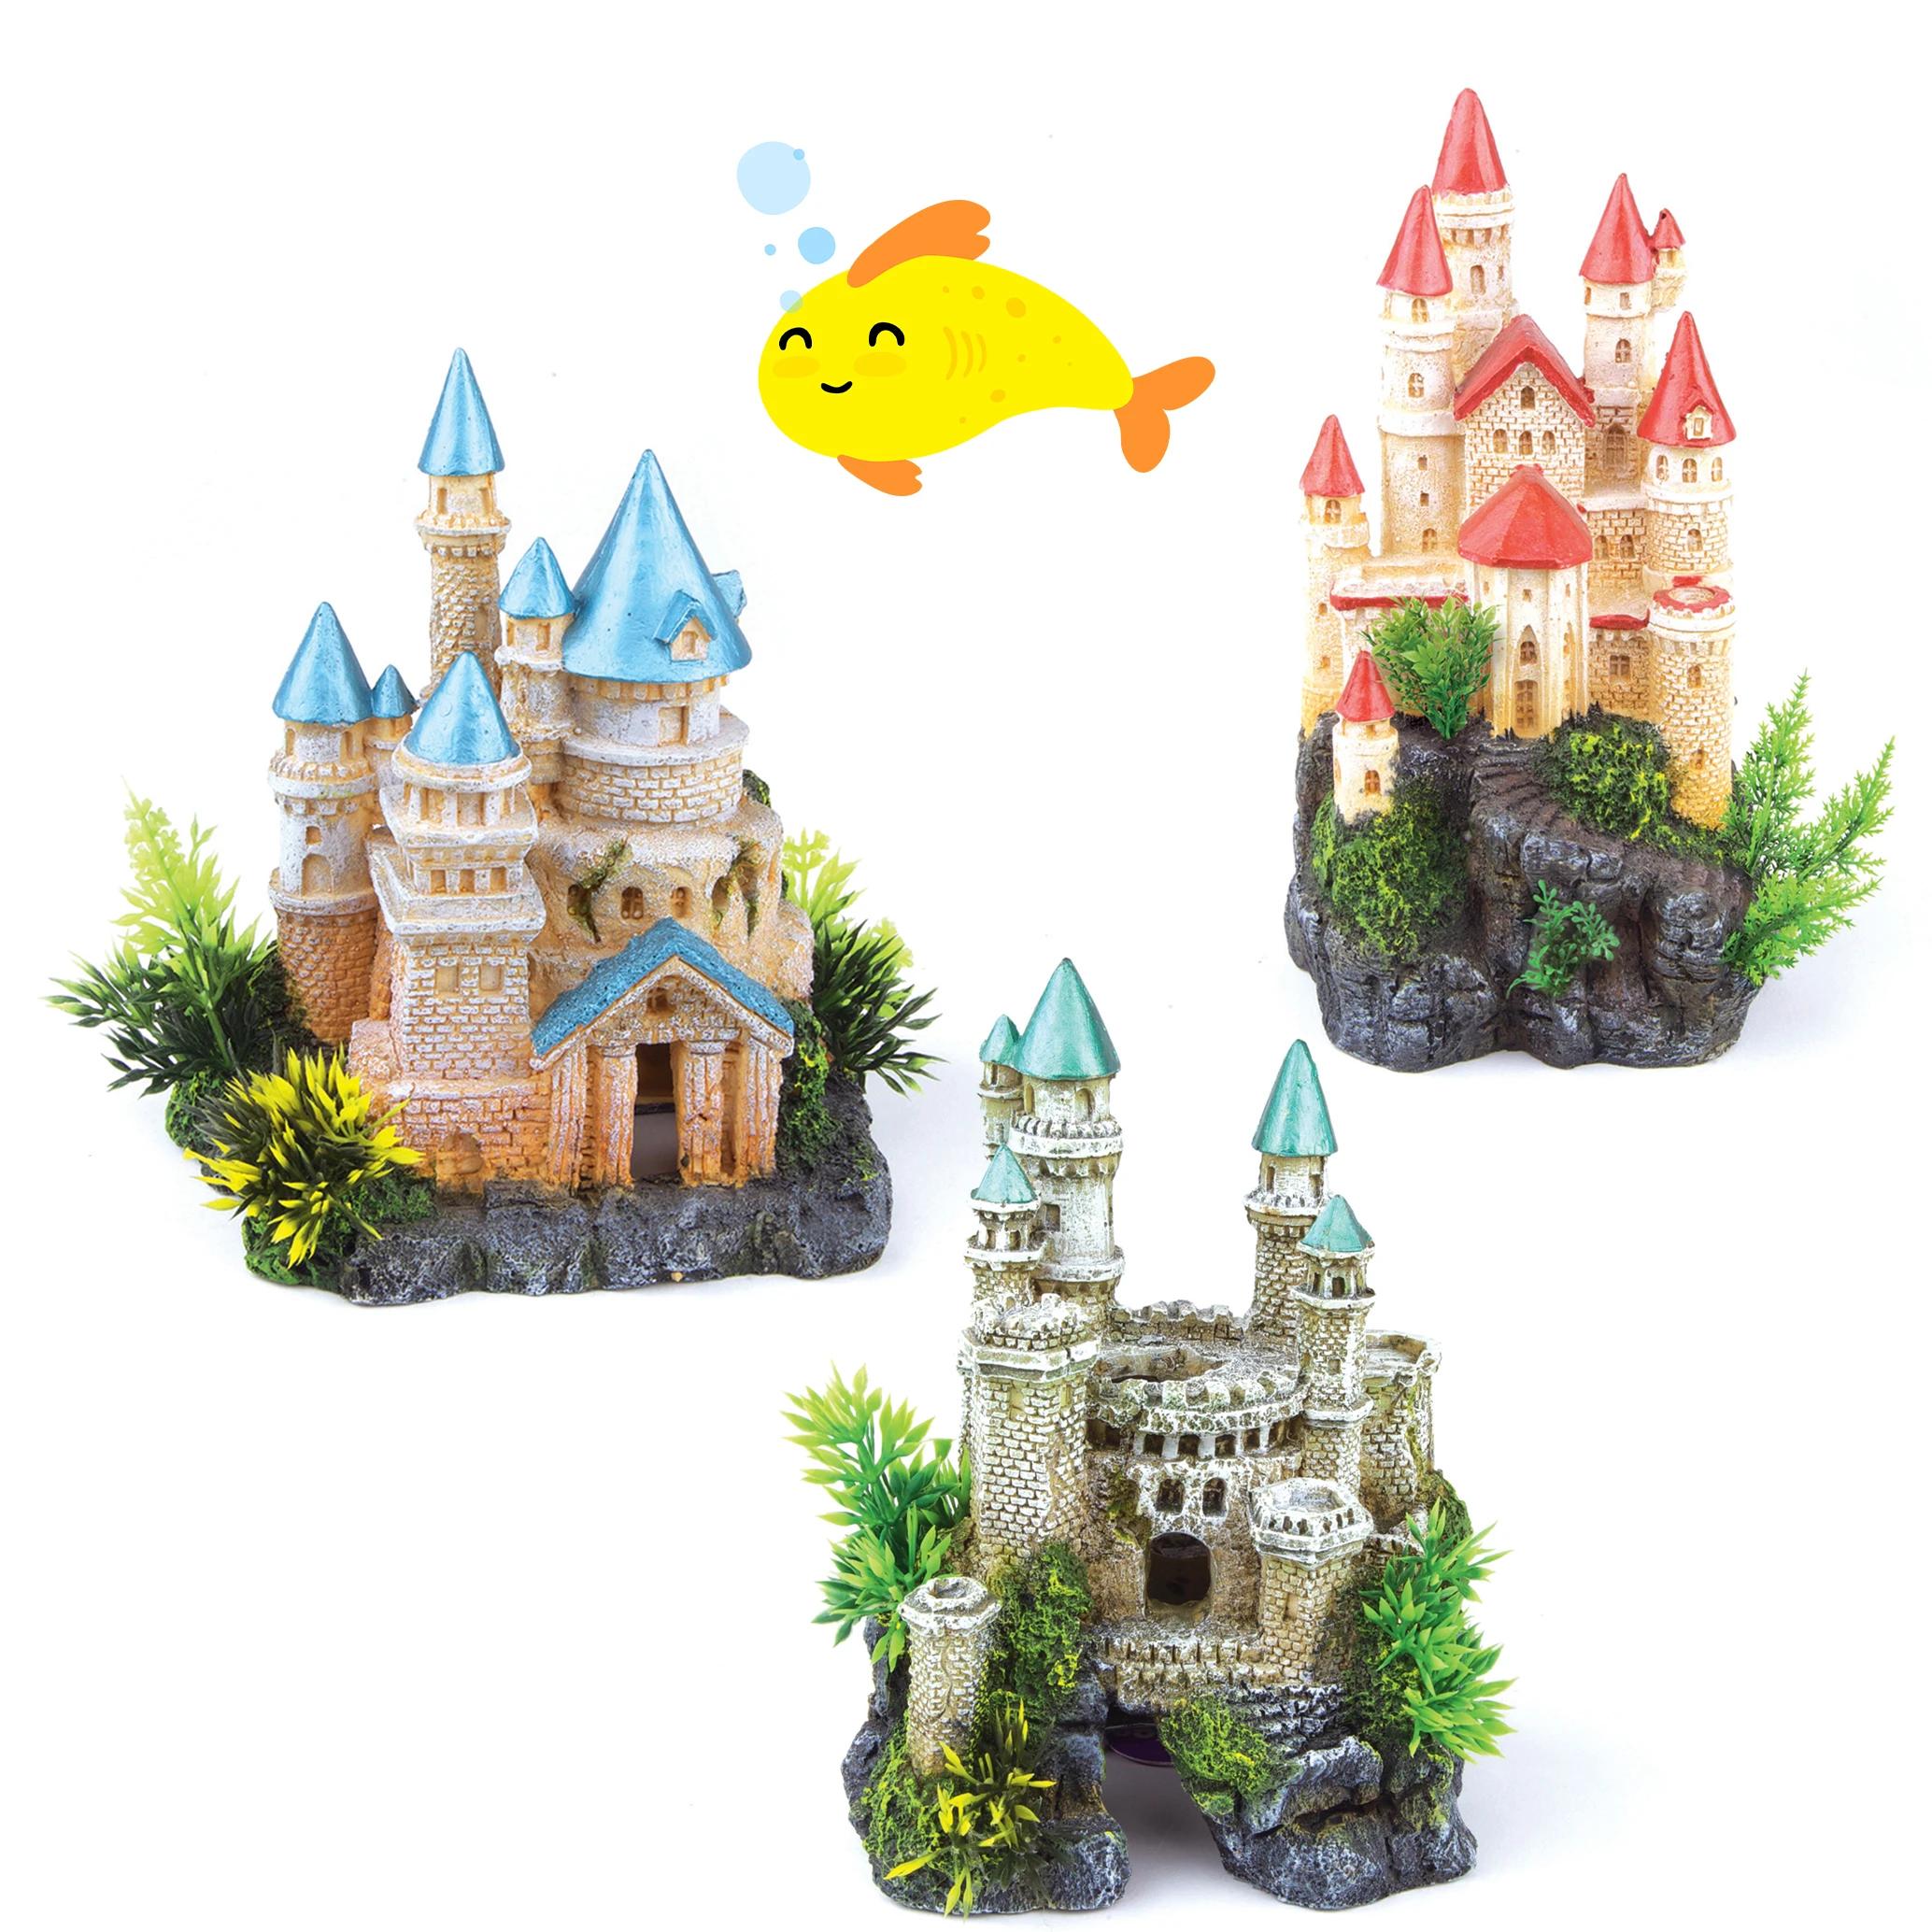 Castle With Plants